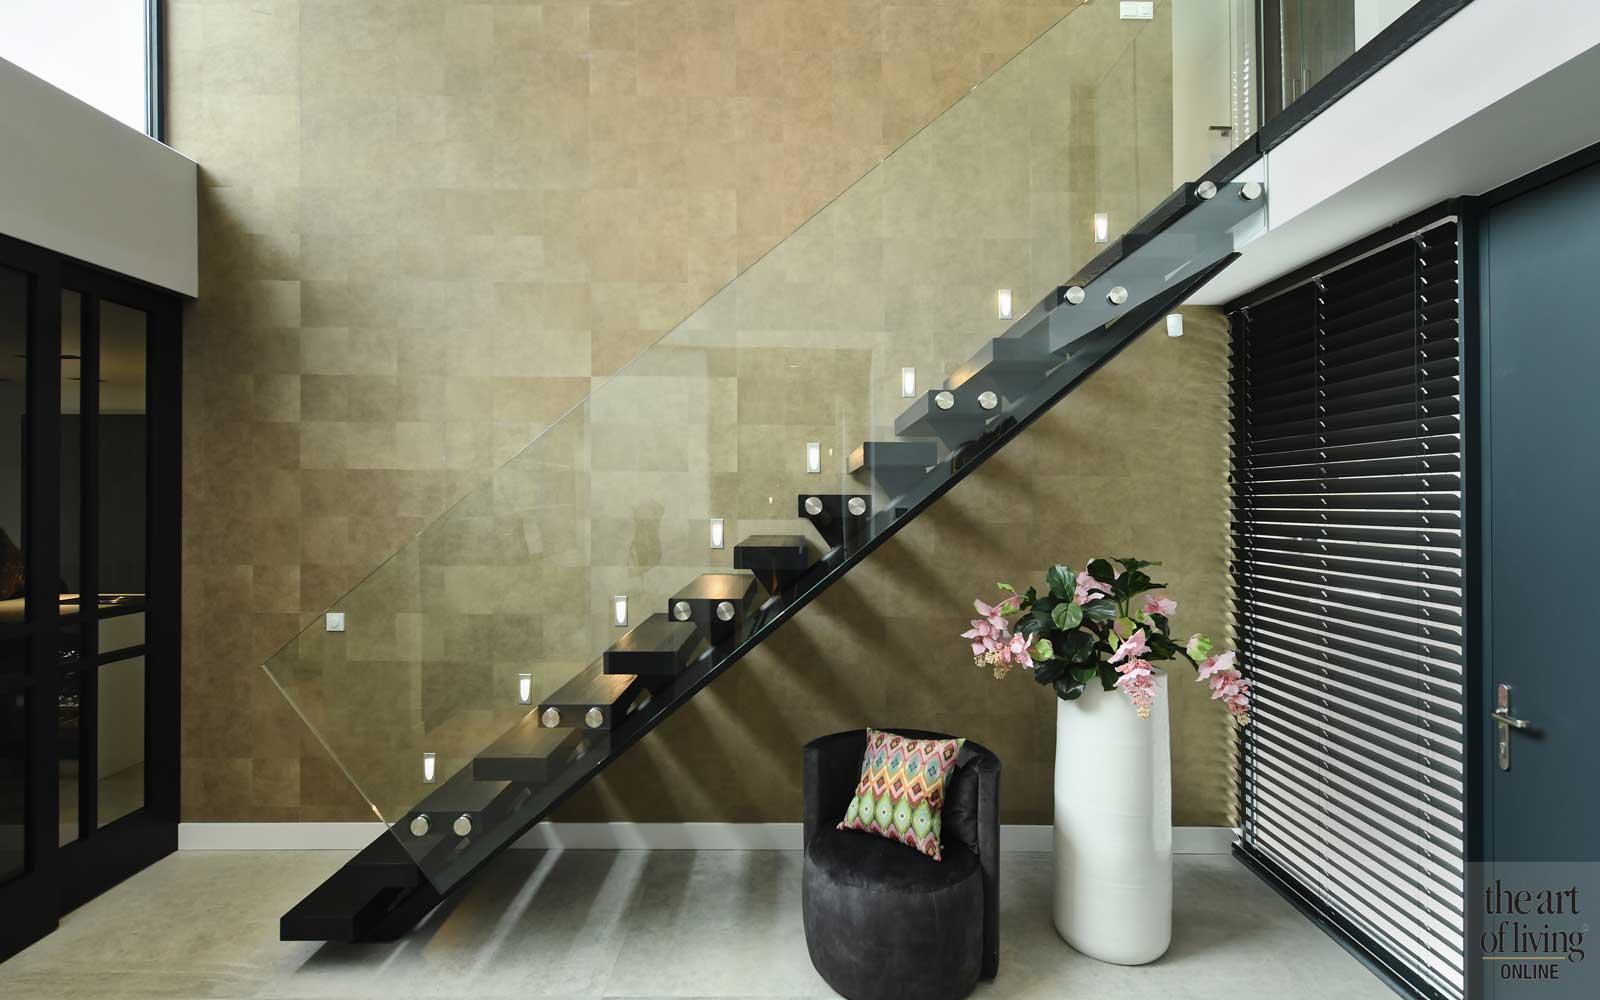 Modern strakke villa, lab32 Architecten, the art of living